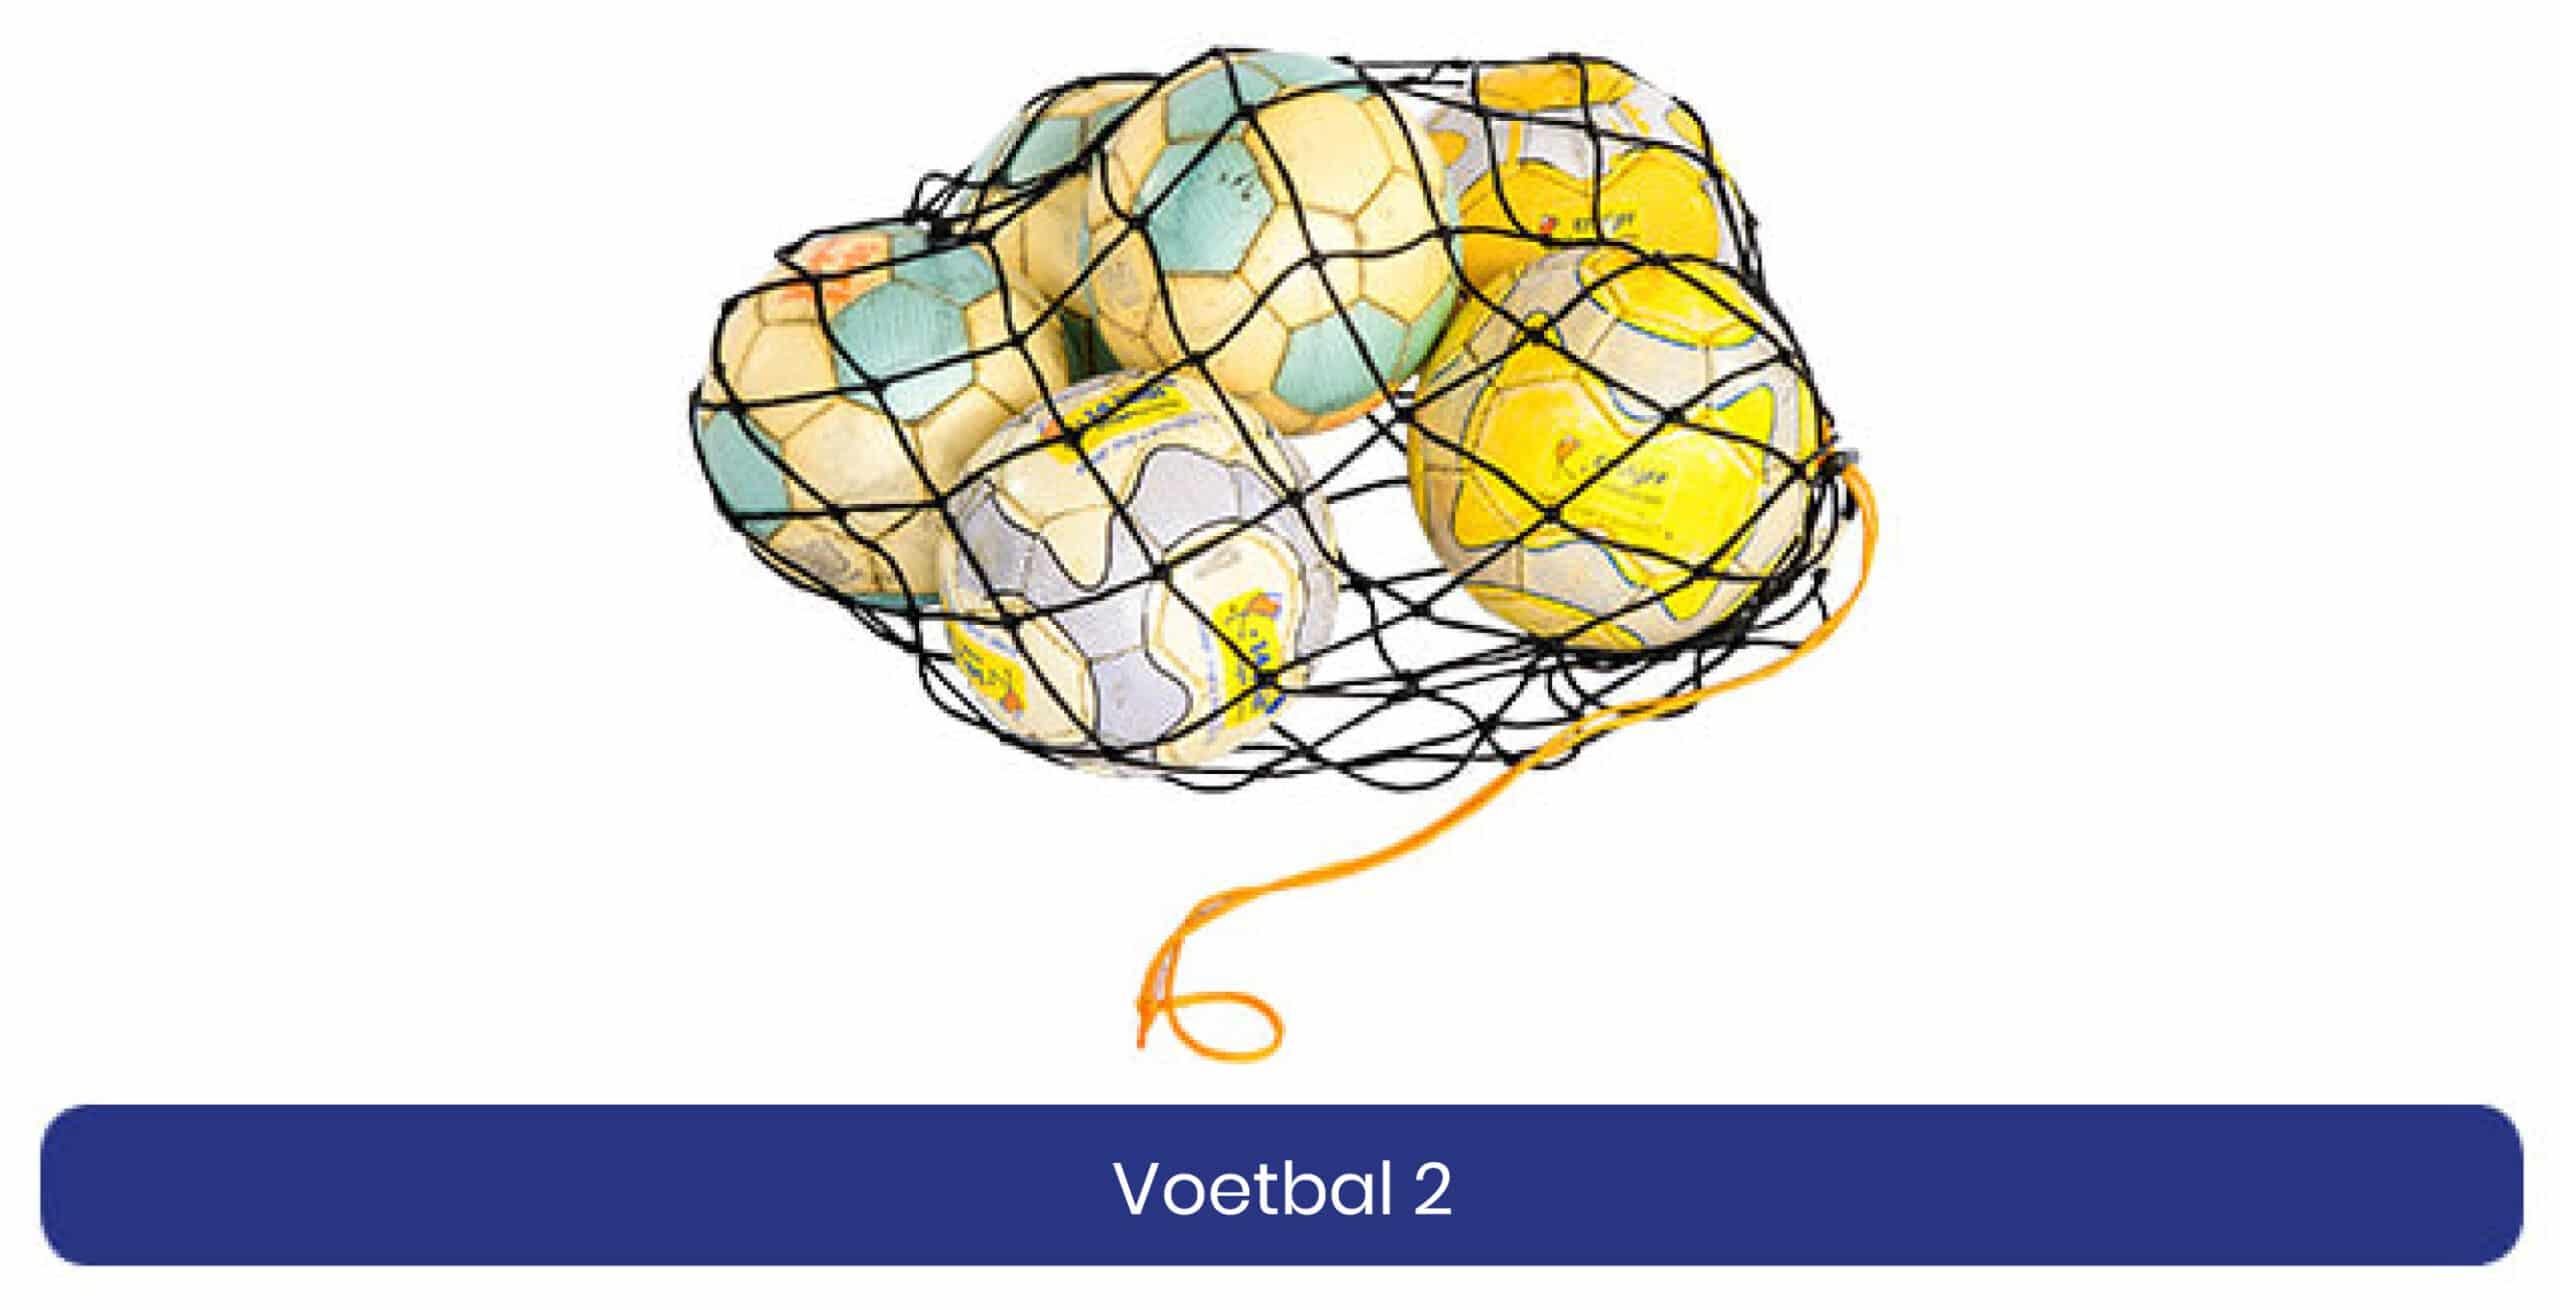 Voetbal 2 lenen product